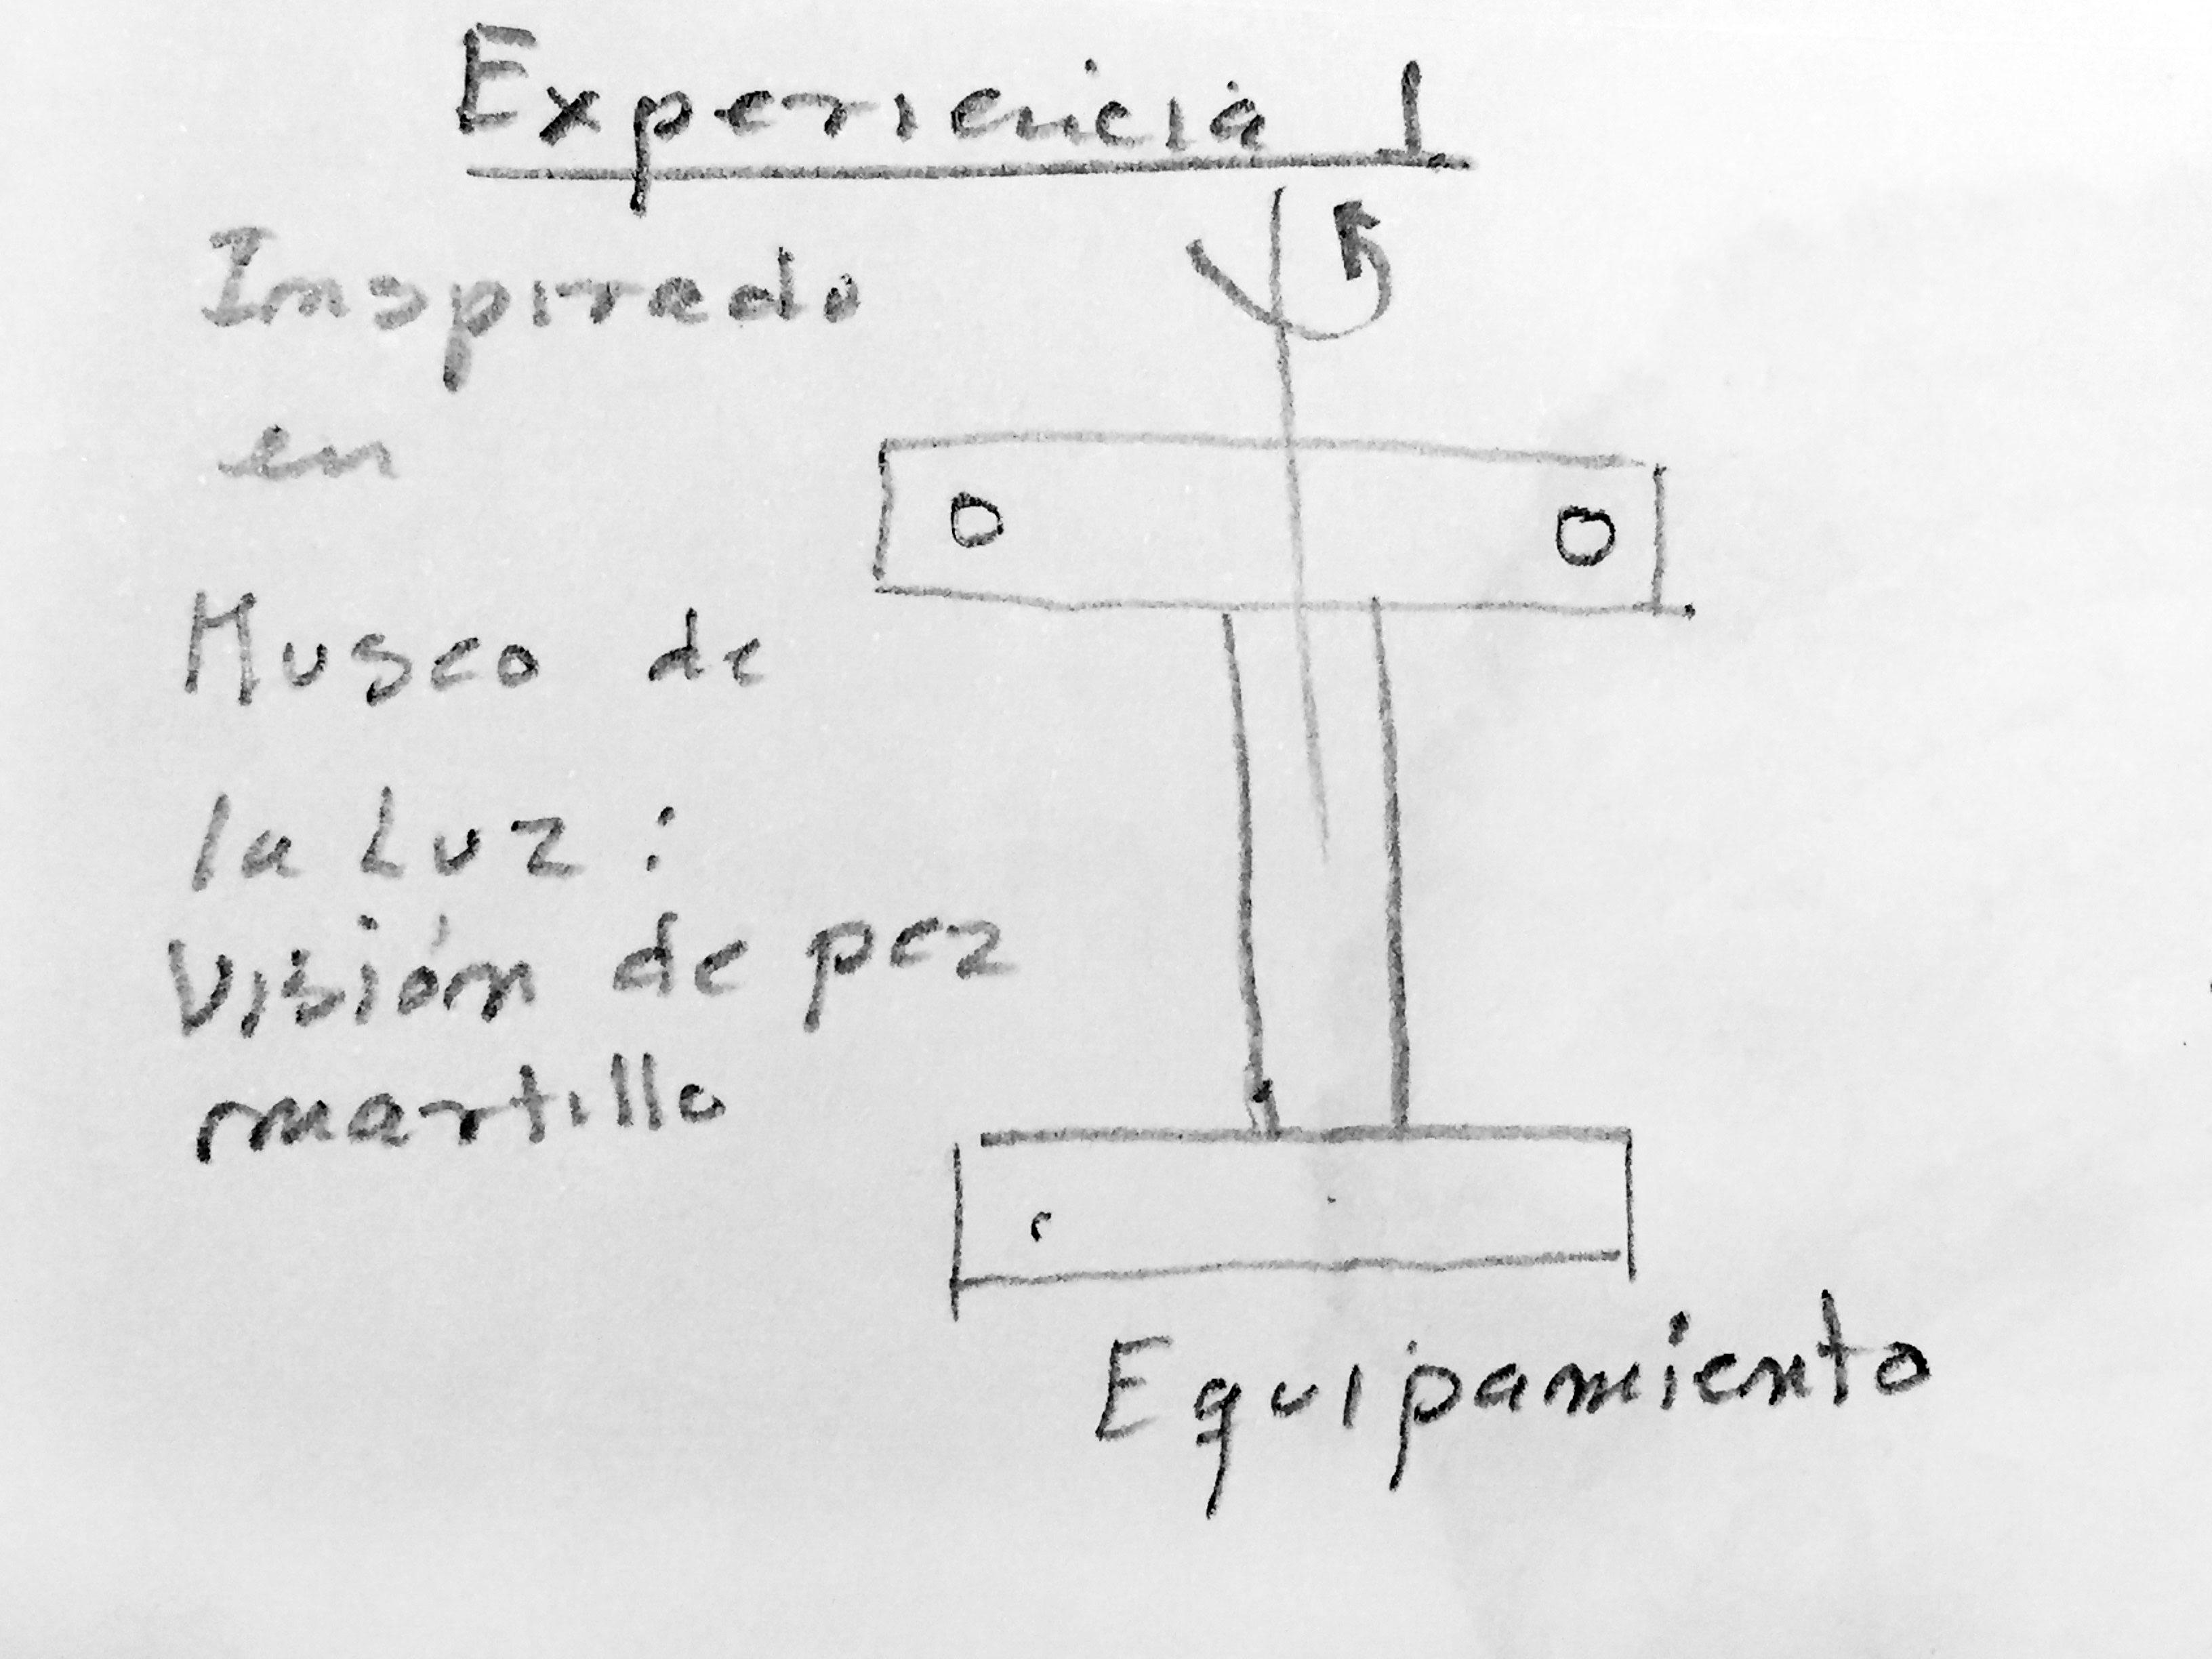 Empatía-5.1.1-4